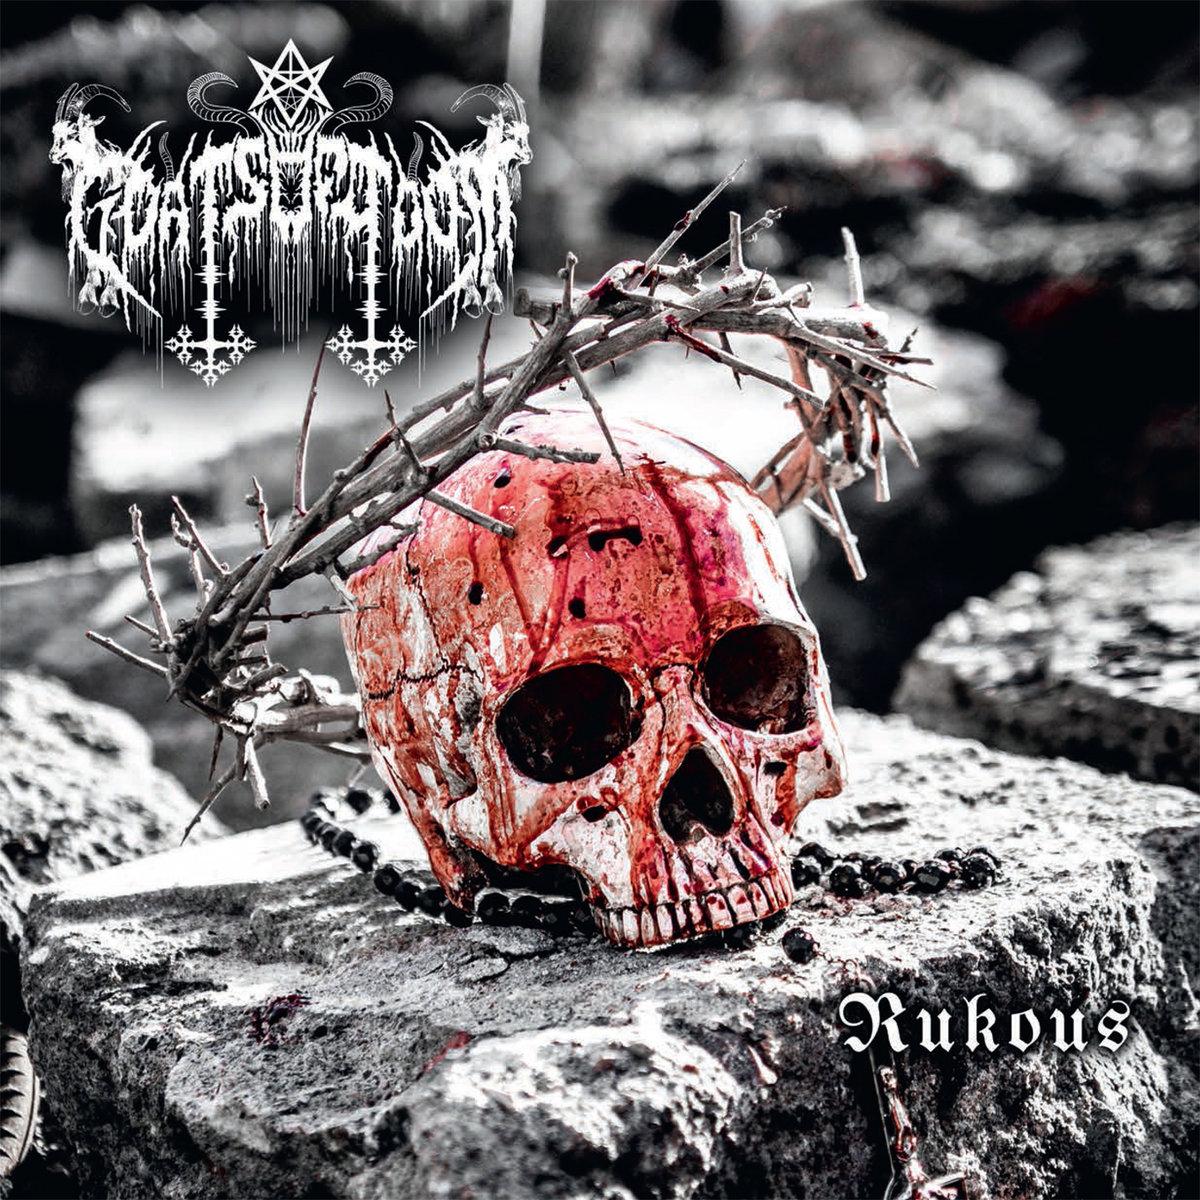 Finnish Black Metal Terrorism: Goats Of Doom